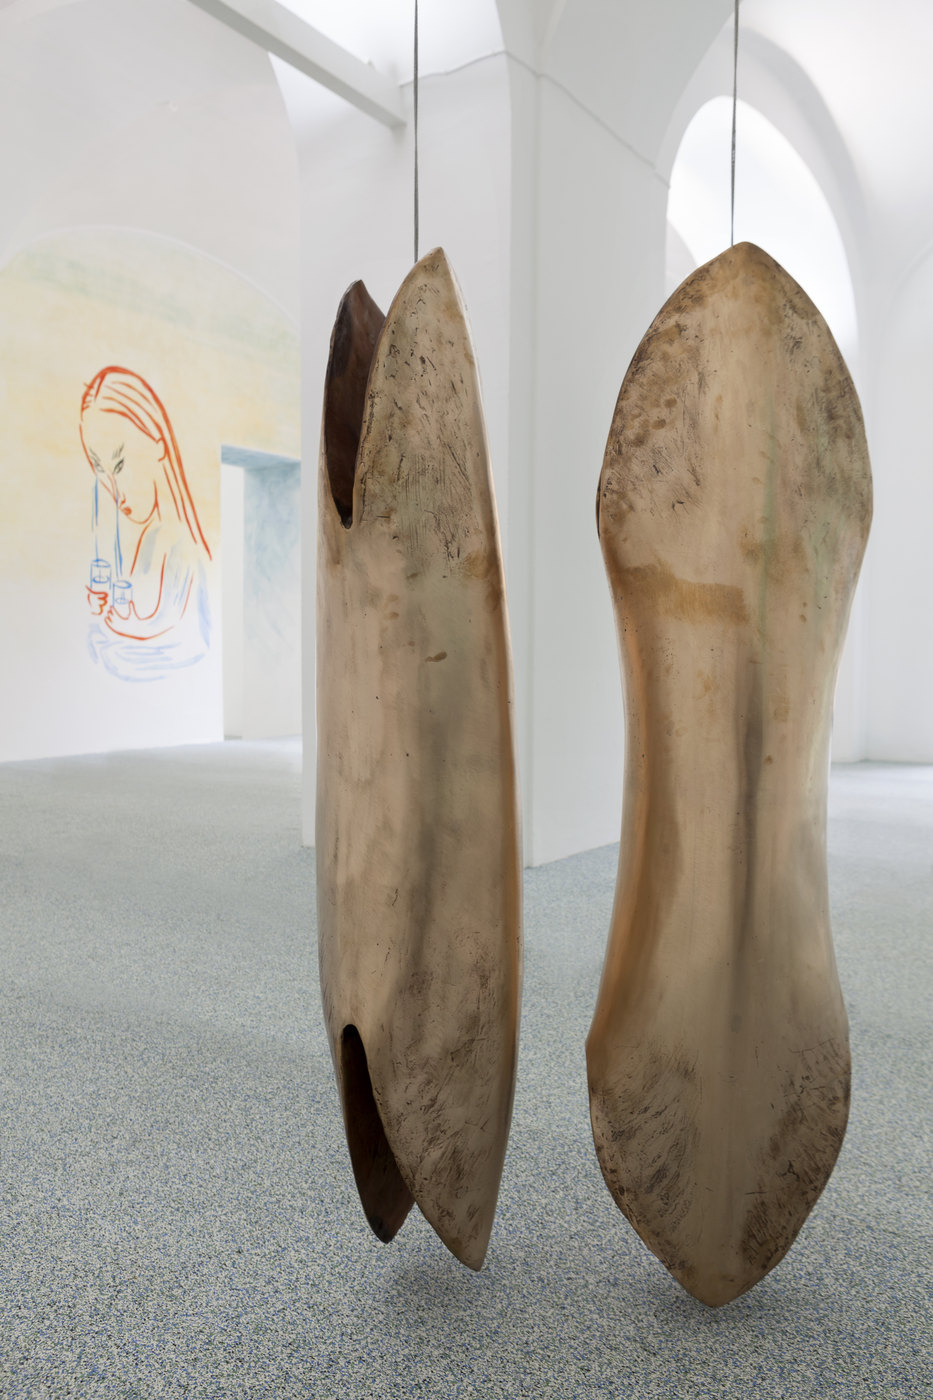 20. Camile Henrot, Punti Cardinali. Bronze, 2016